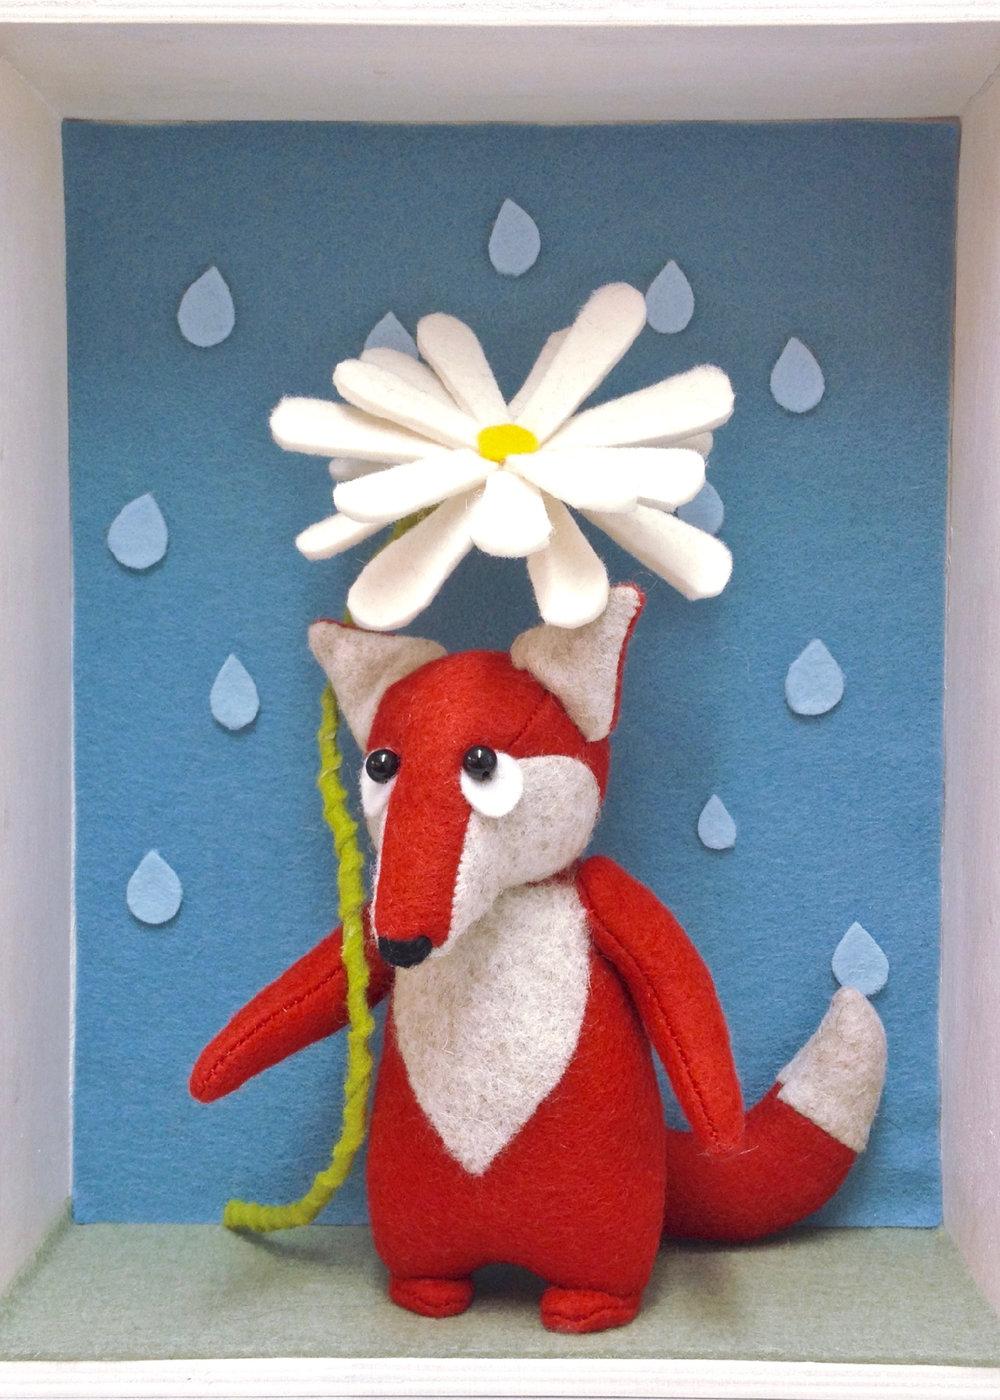 Bilberry Woods fox with a felt daisy umbrella by Laura Mirjami